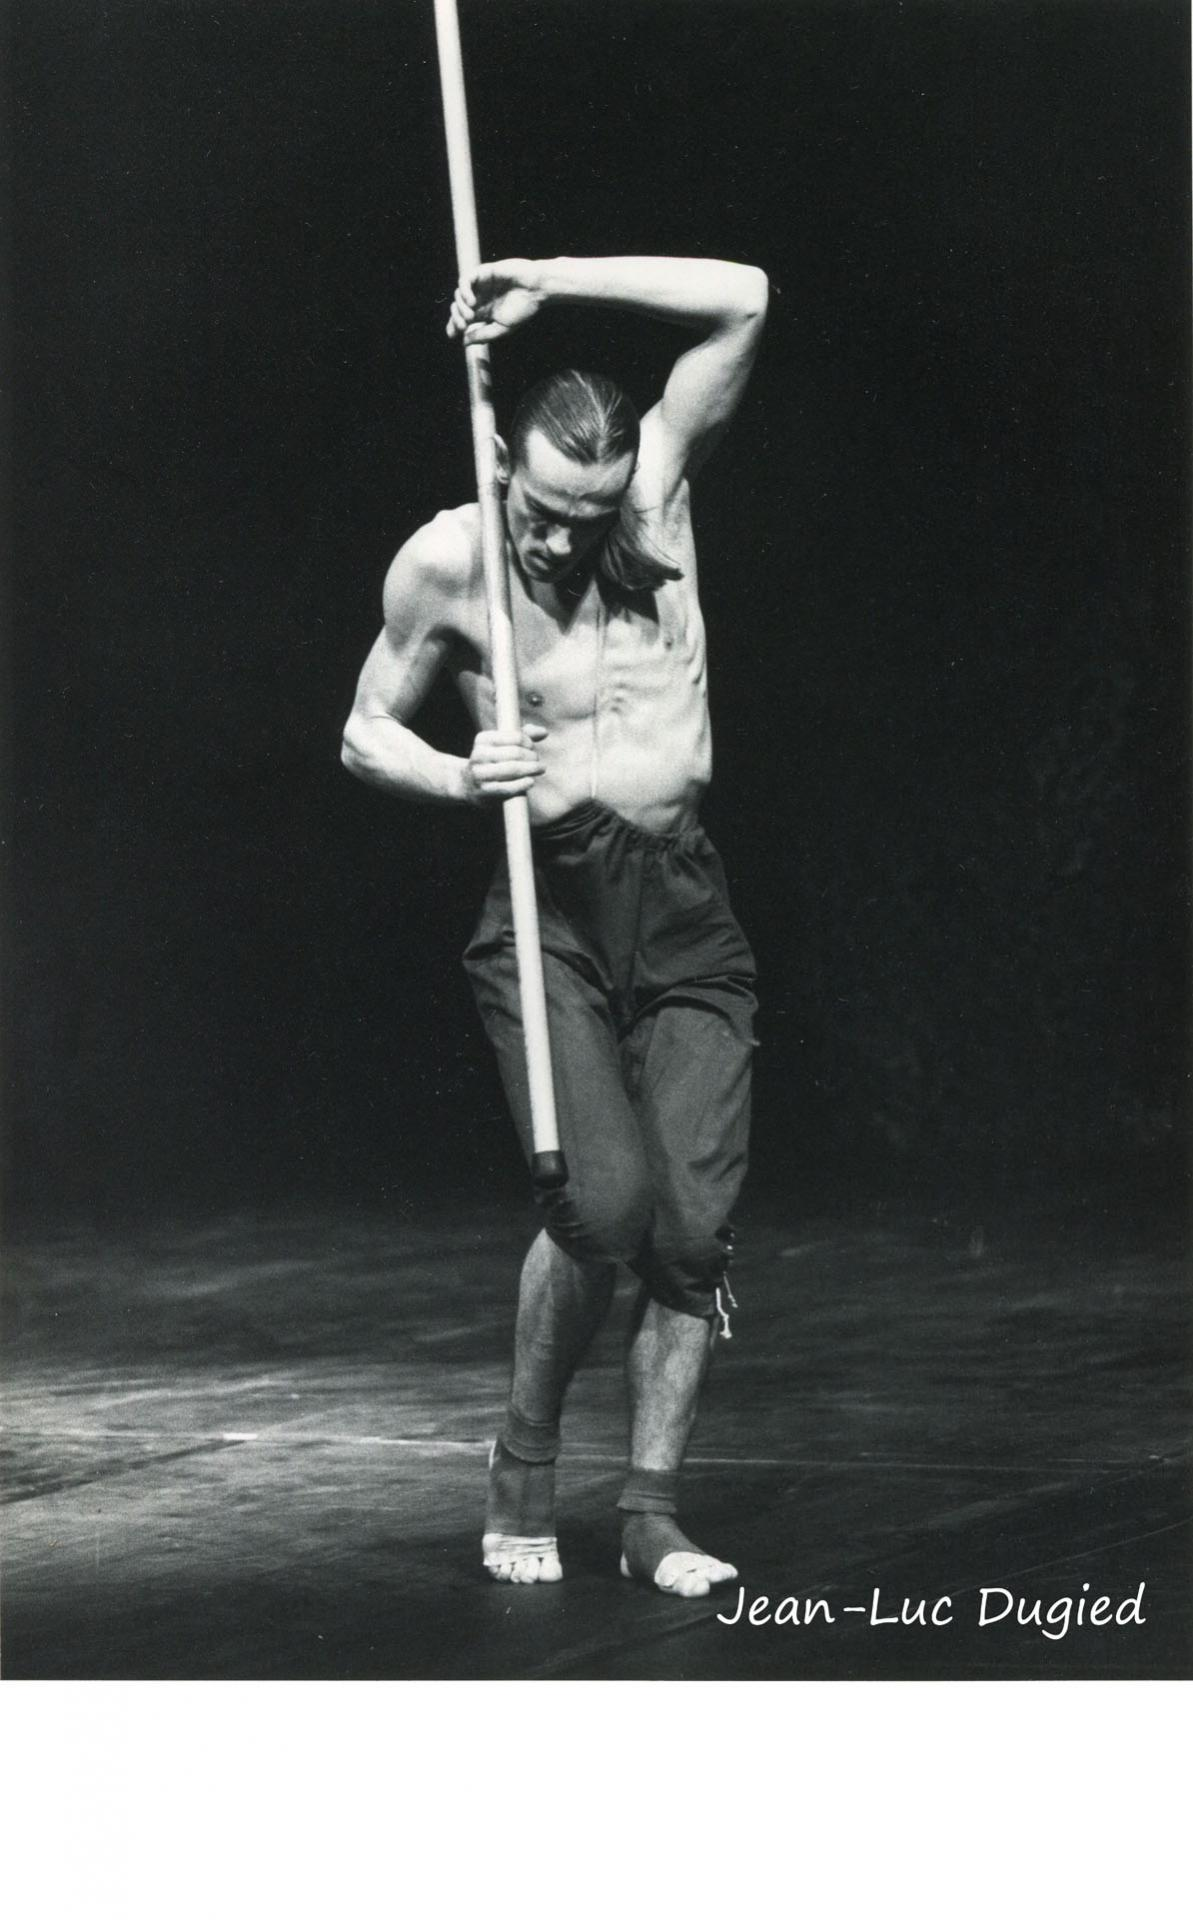 20 Diasnas Hervé - Nai ou cristal qui songe - 1984